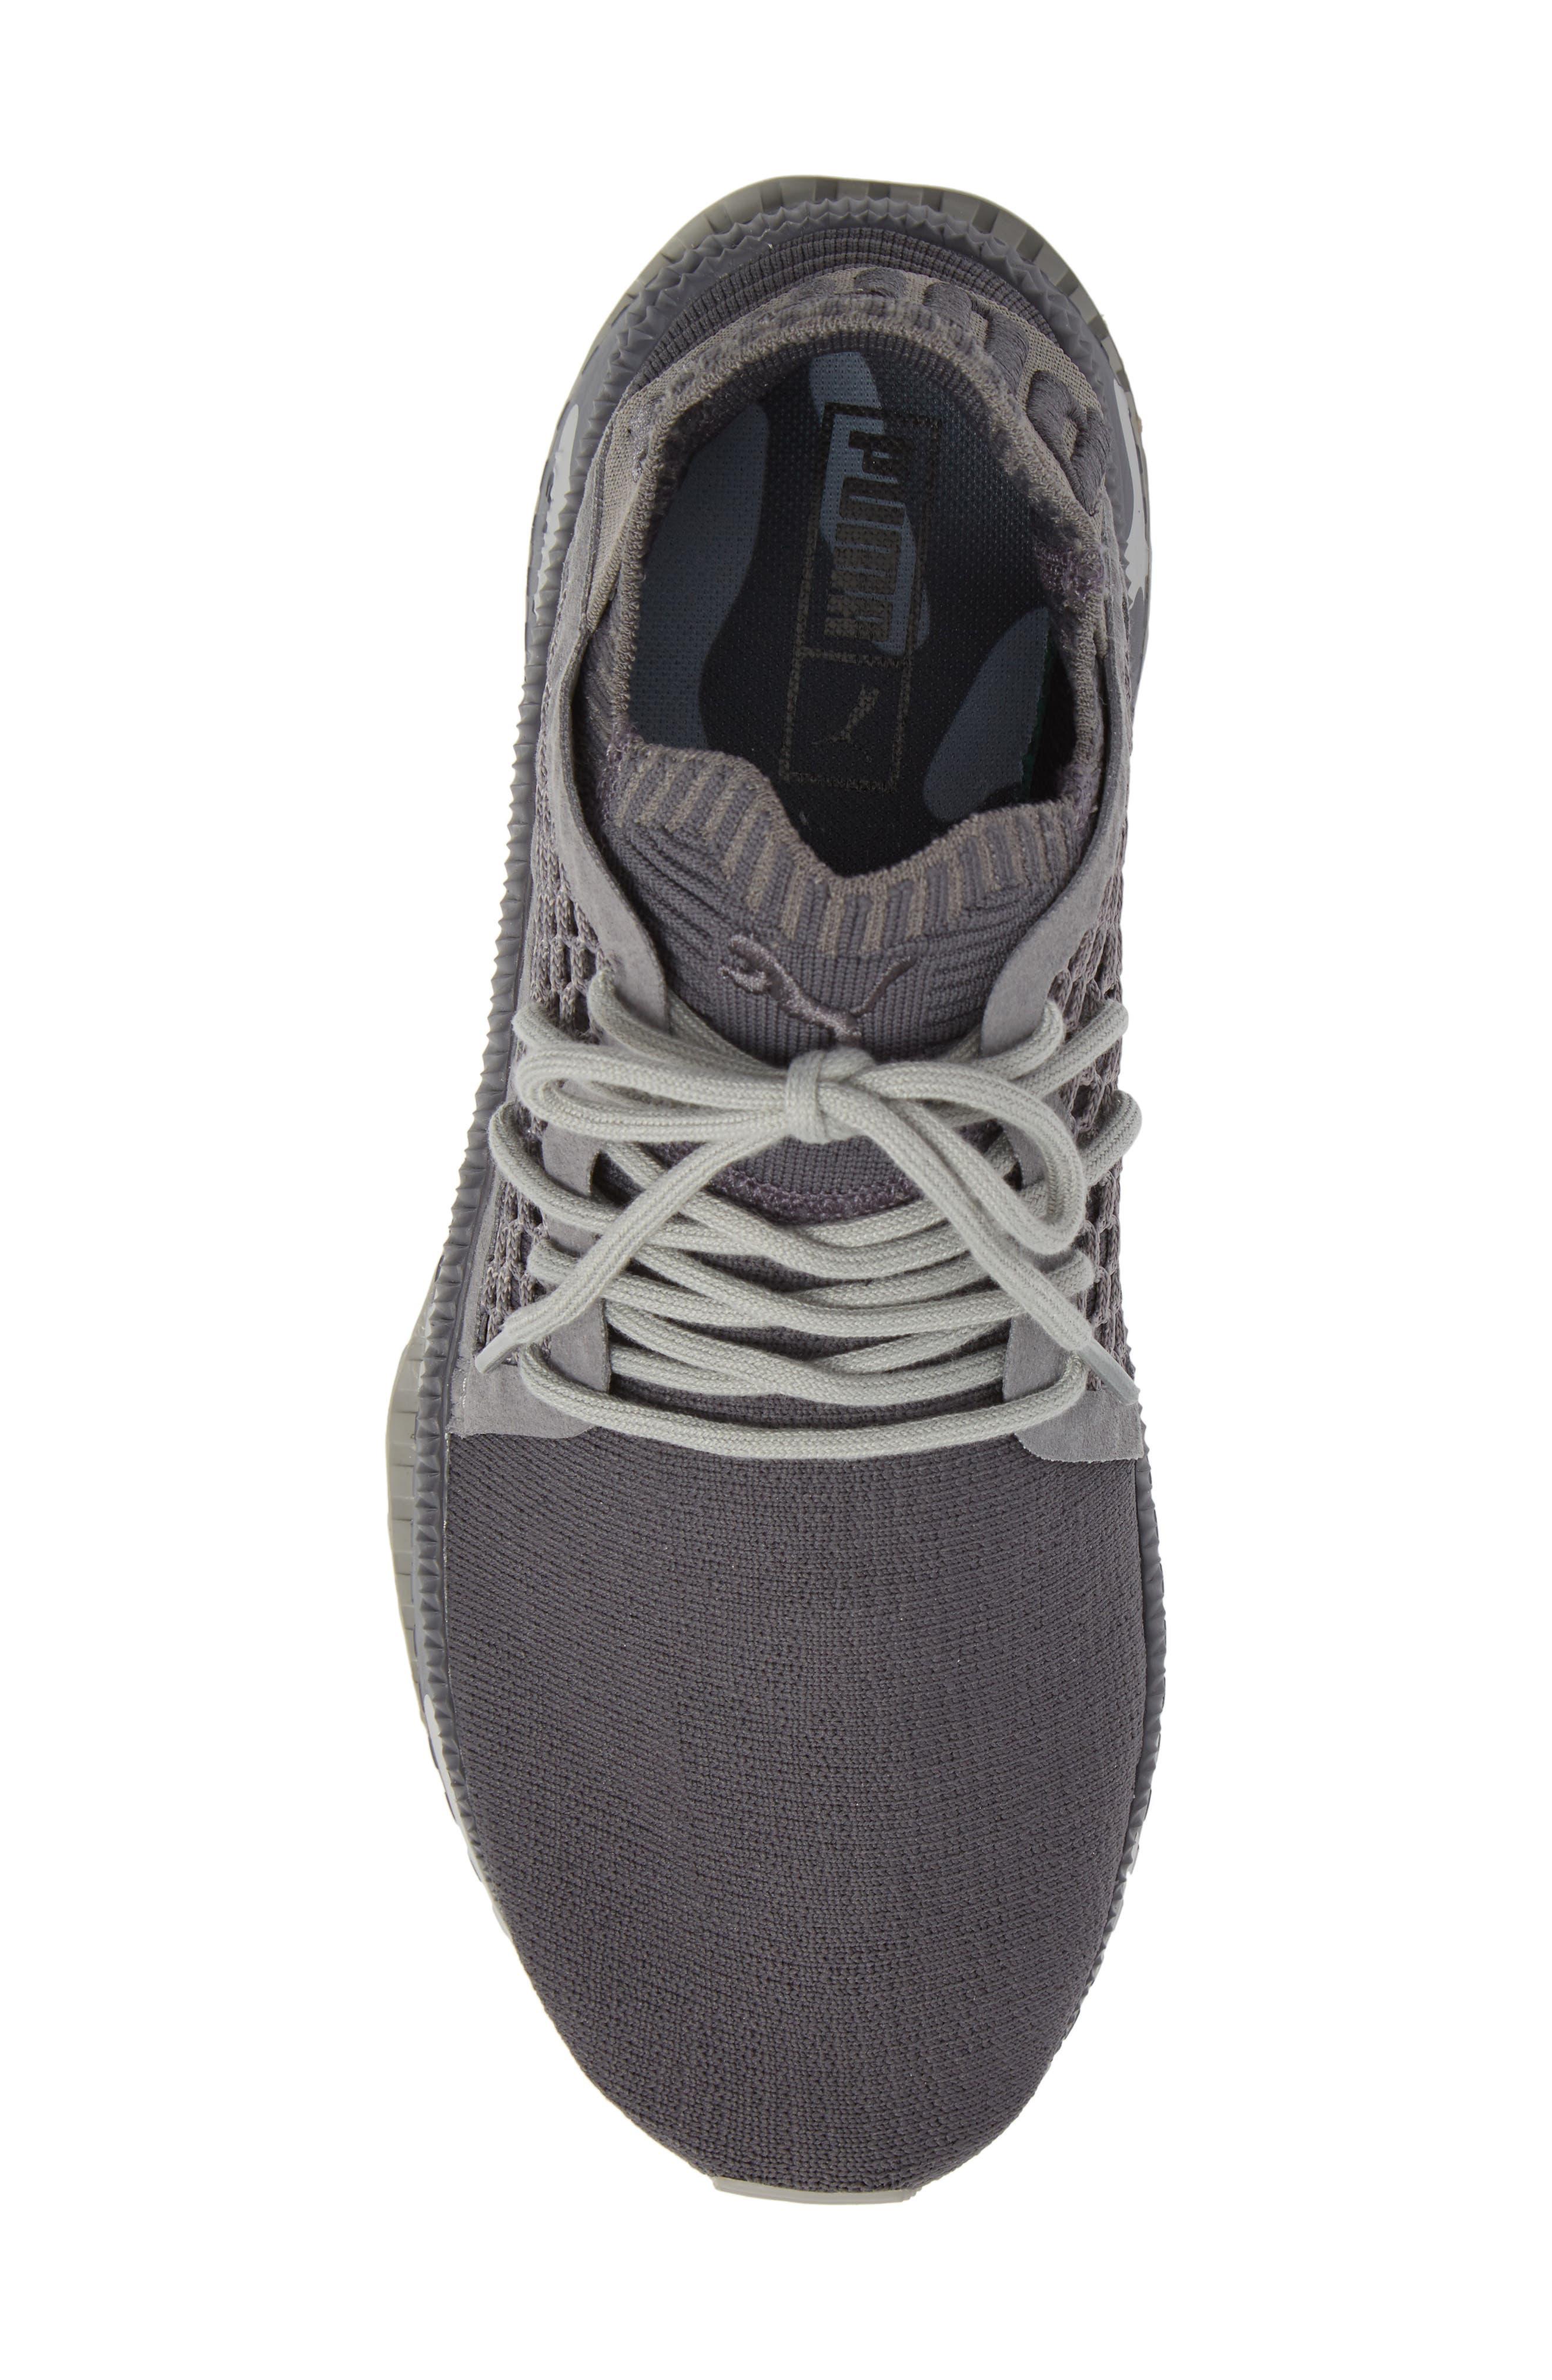 Tsugi Netfit evoKNIT Training Shoe,                             Alternate thumbnail 5, color,                             Quiet Shade-Asphalt